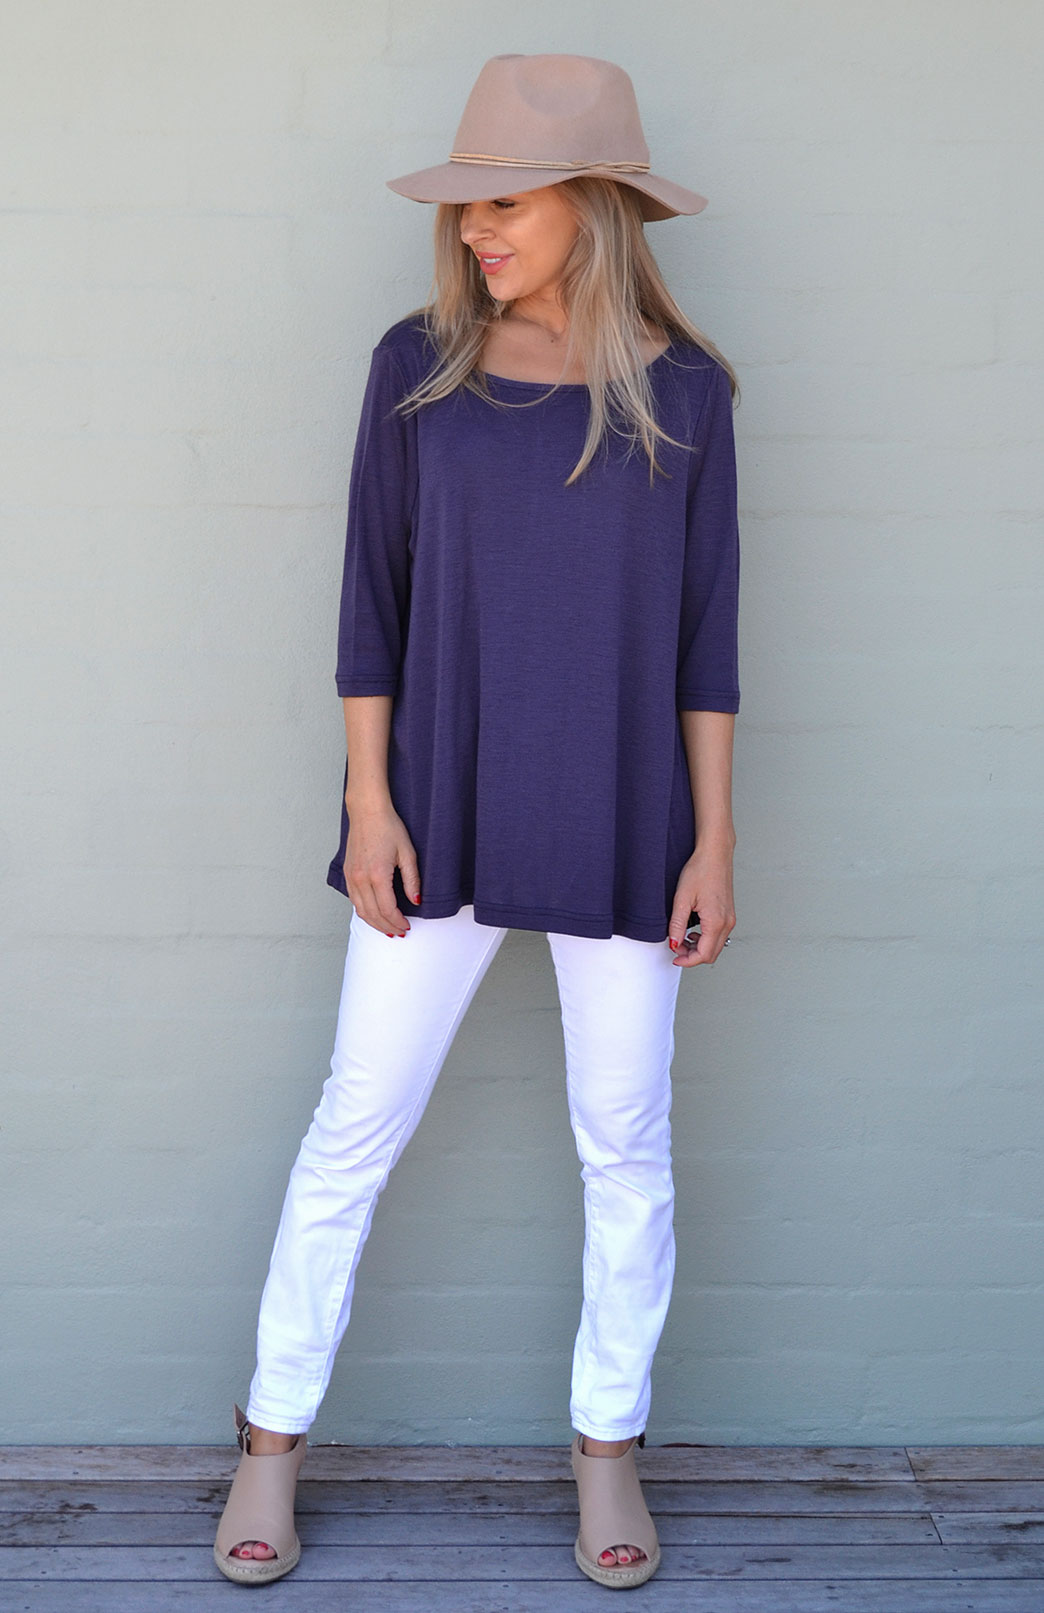 3/4 Flutter Top - Women's Grape Merino Wool 3/4 Sleeve Spring Top - Smitten Merino Tasmania Australia